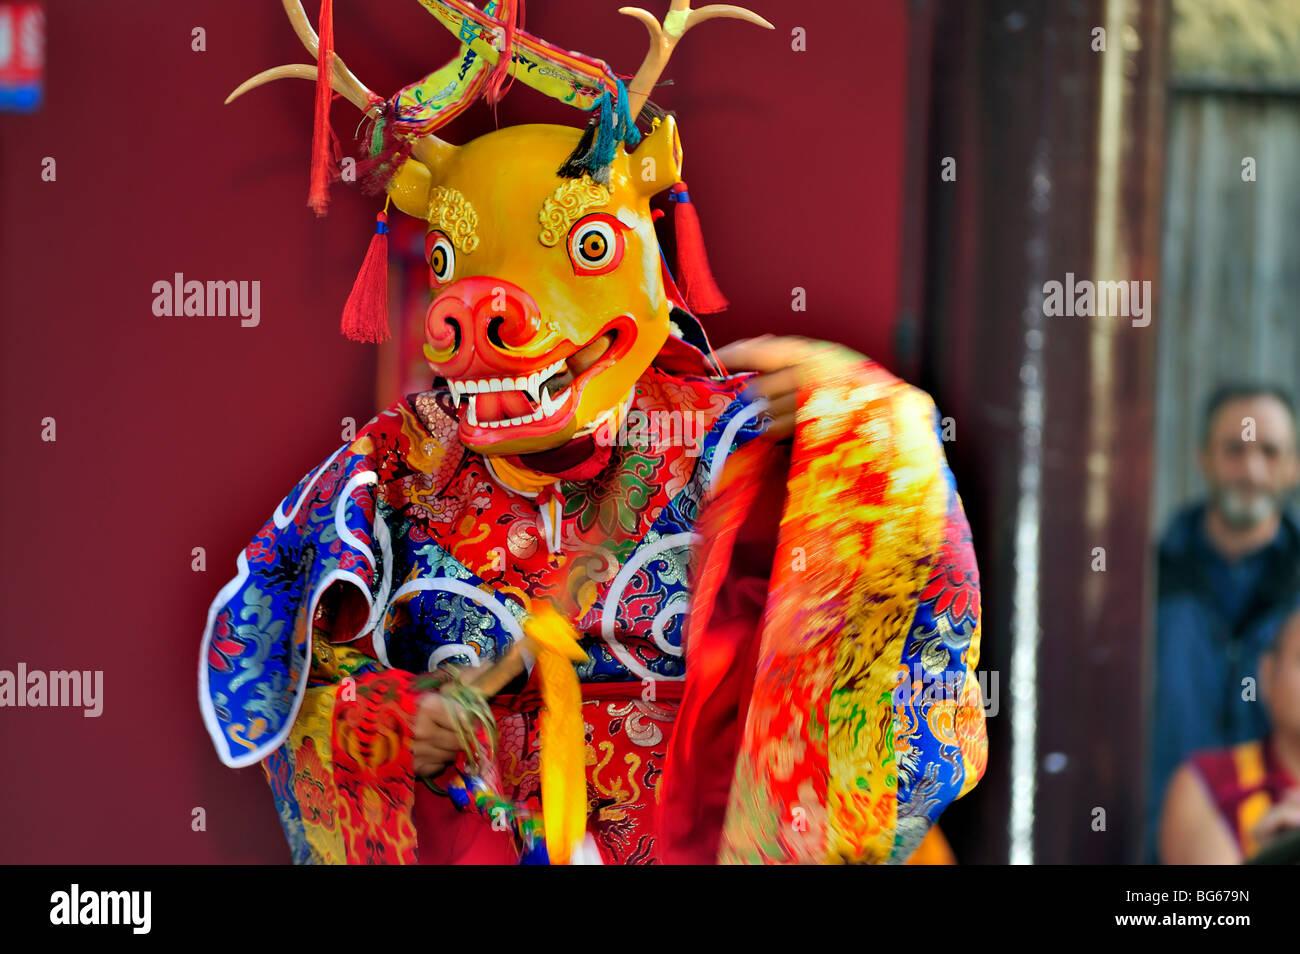 Tibetan Monk in Traditional Dress, Performing Ritual Animal Mask Dance, Buddhist Ceremony, Pagoda Stock Photo